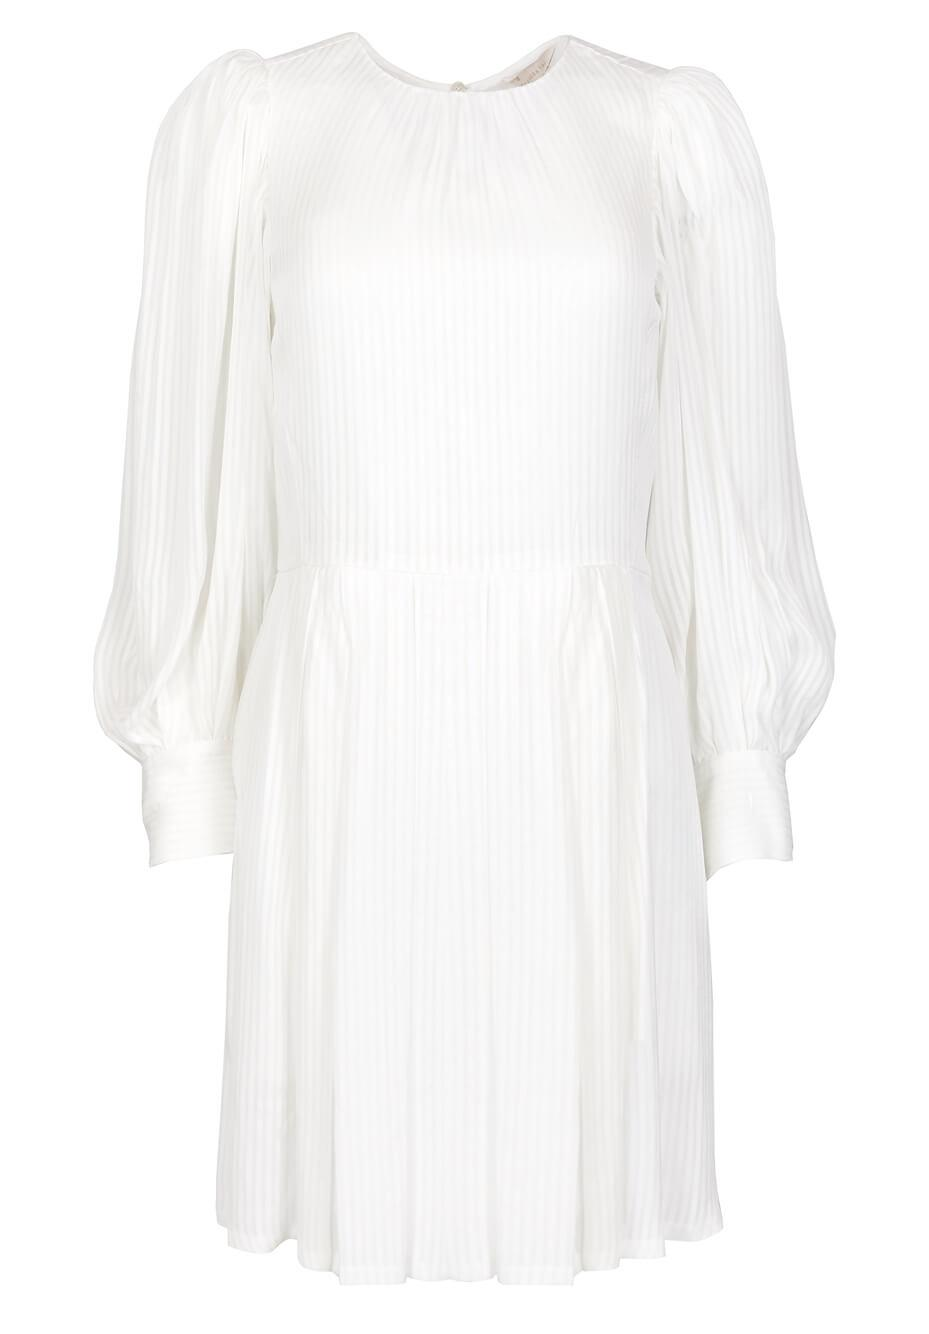 Shadow Stripe Dress Item # 121124D844